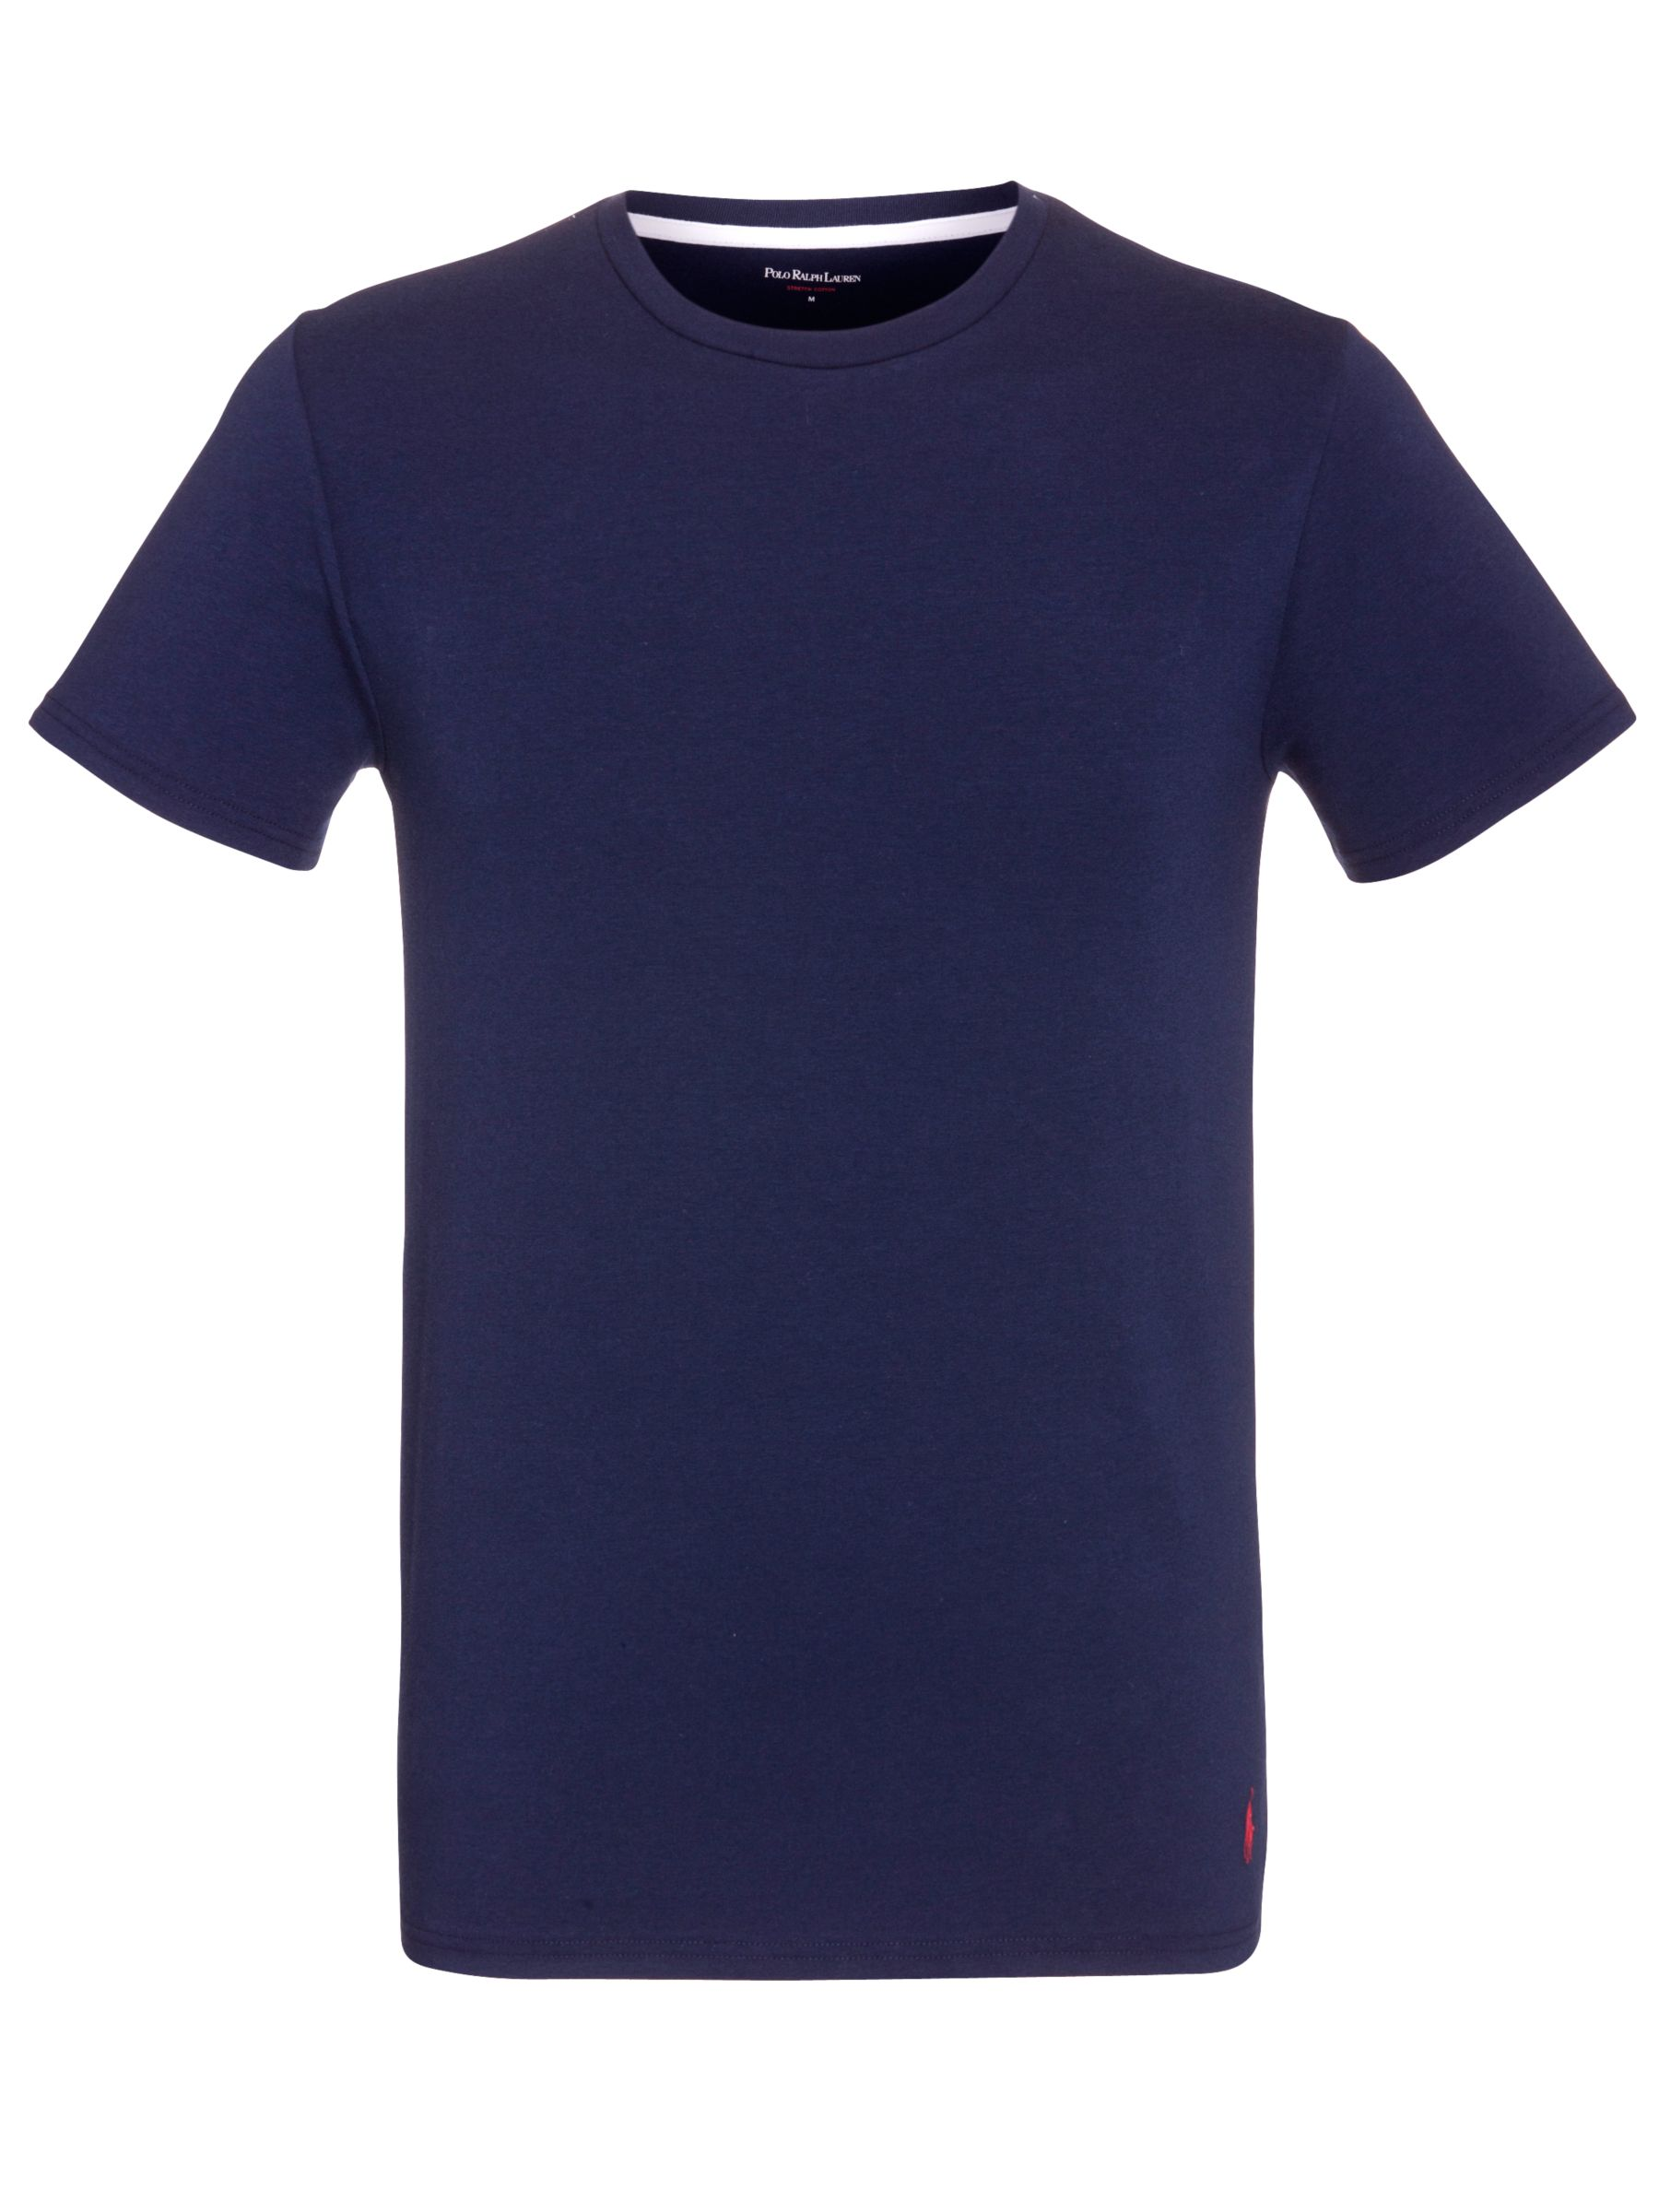 Polo Ralph Lauren Stretch Crew Neck T-Shirt, Navy